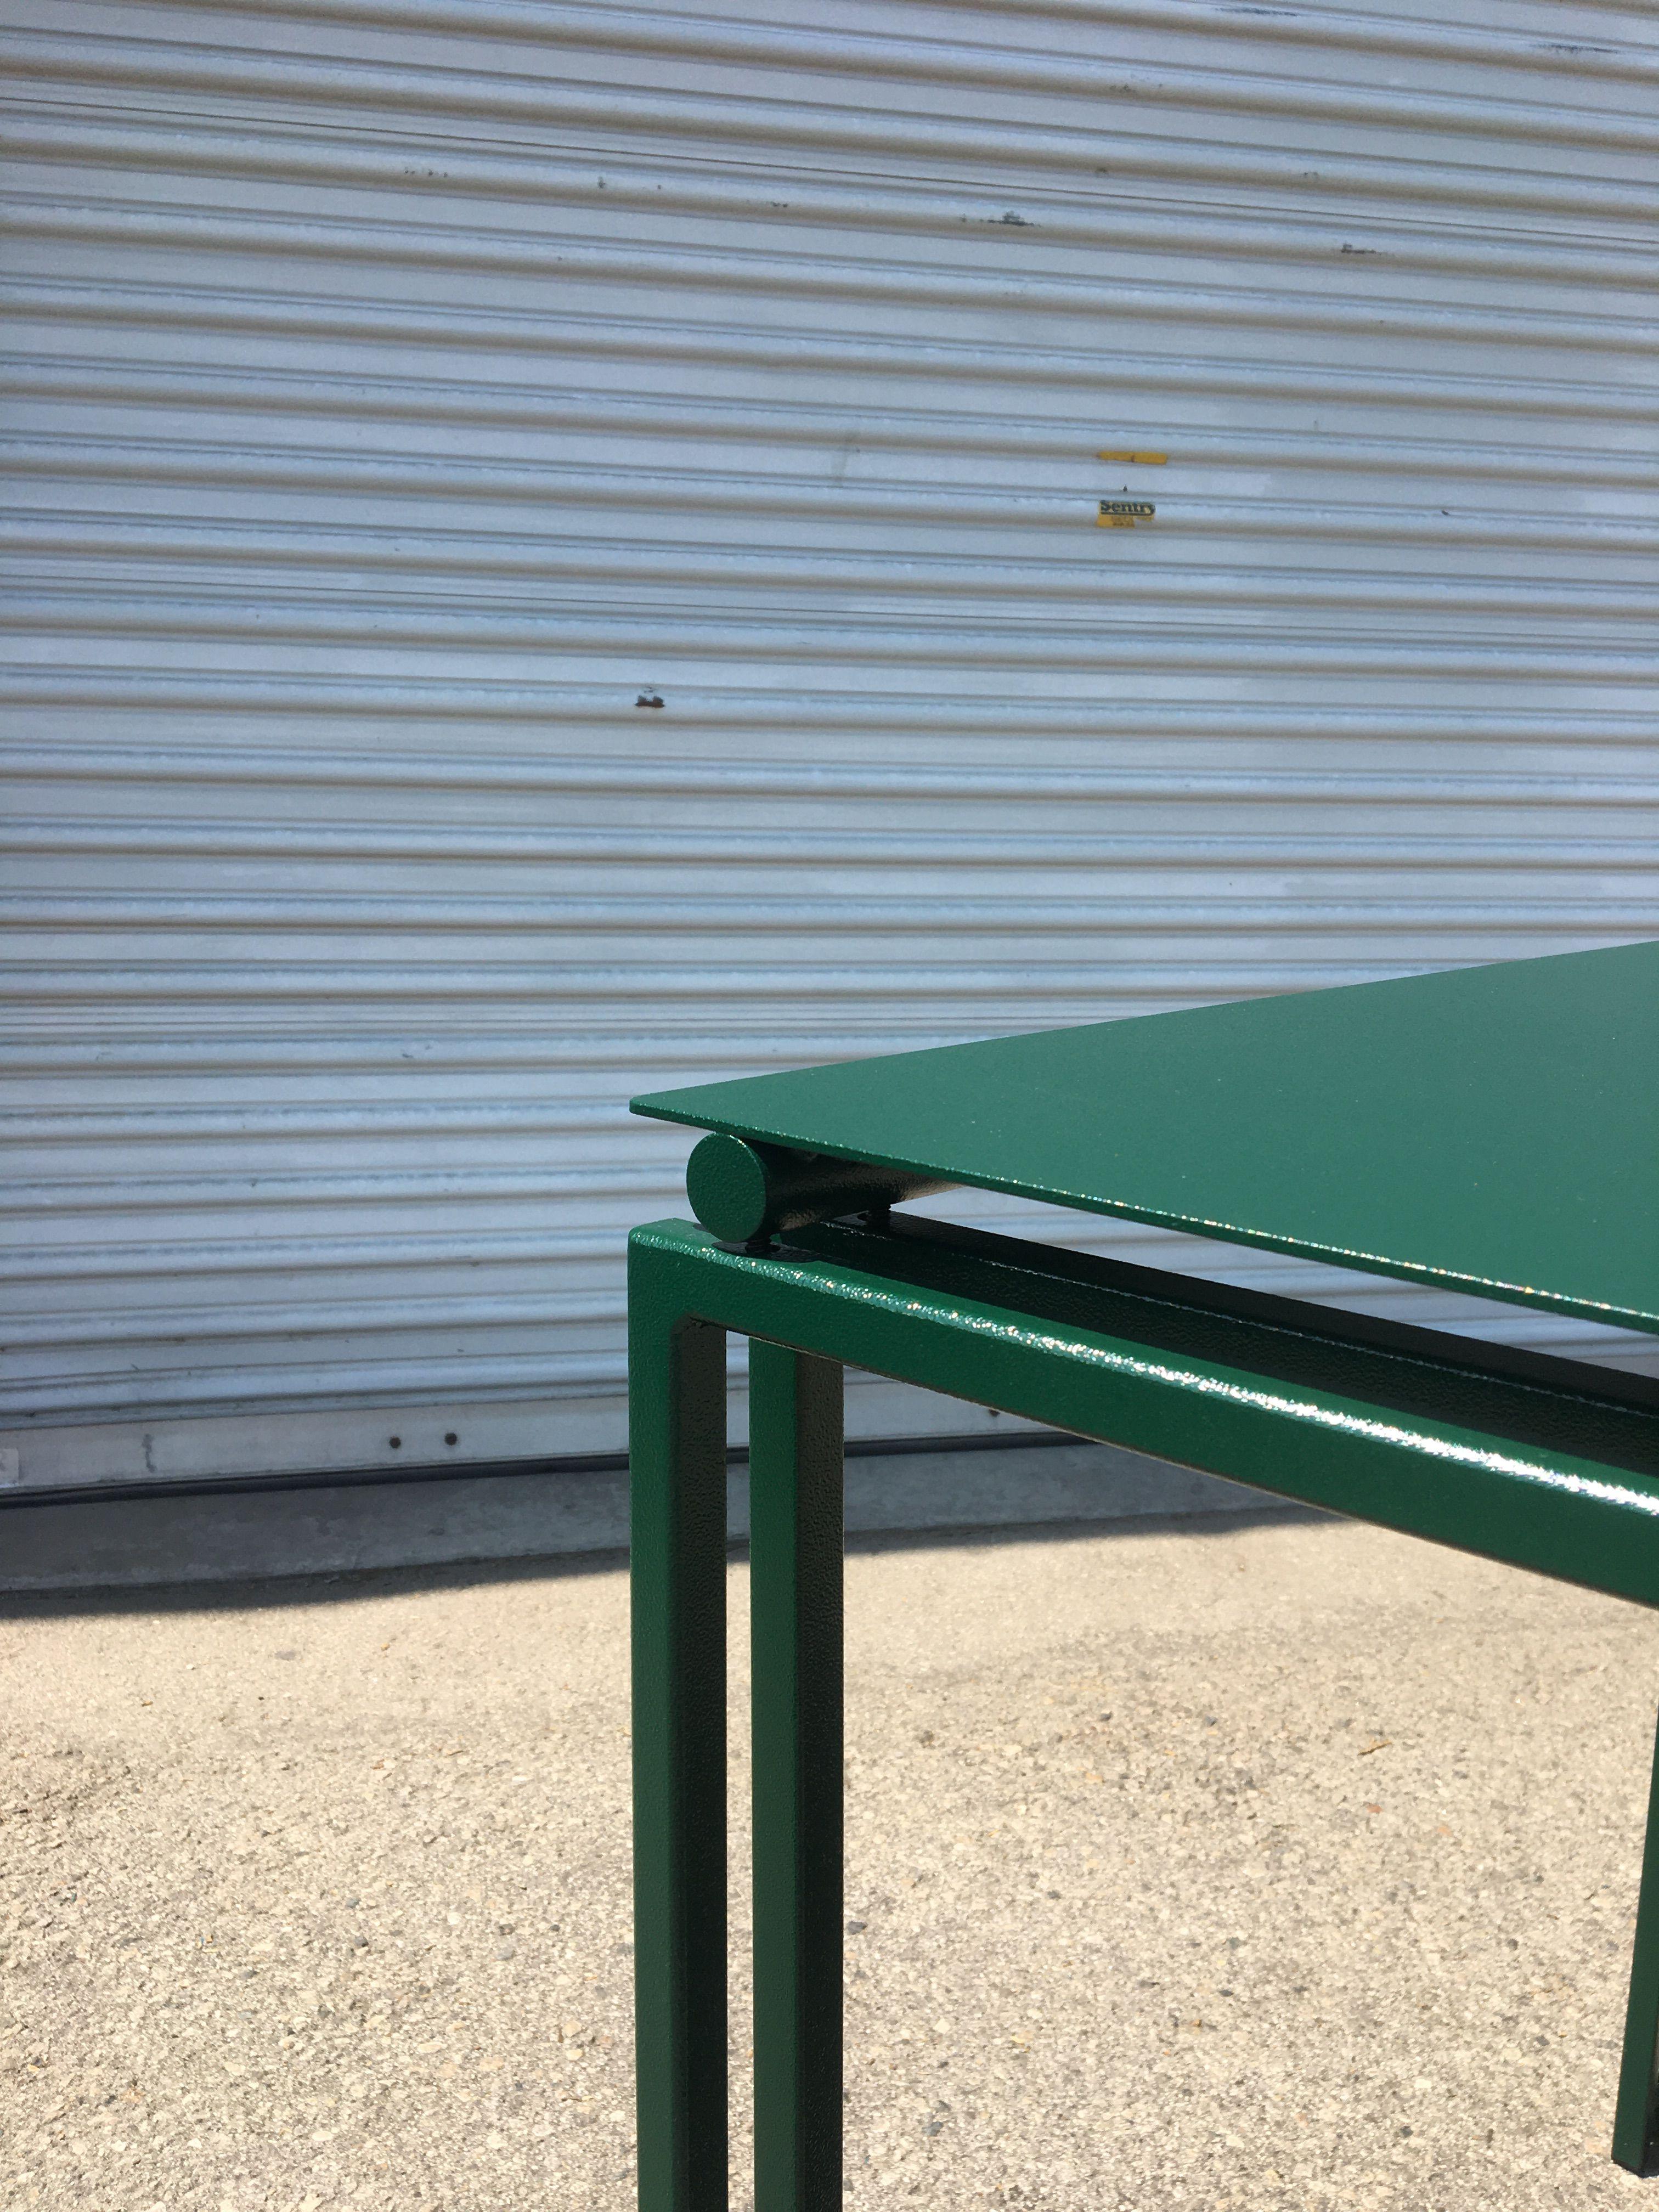 Suspension Metal Set - Breakfast Size product image 15